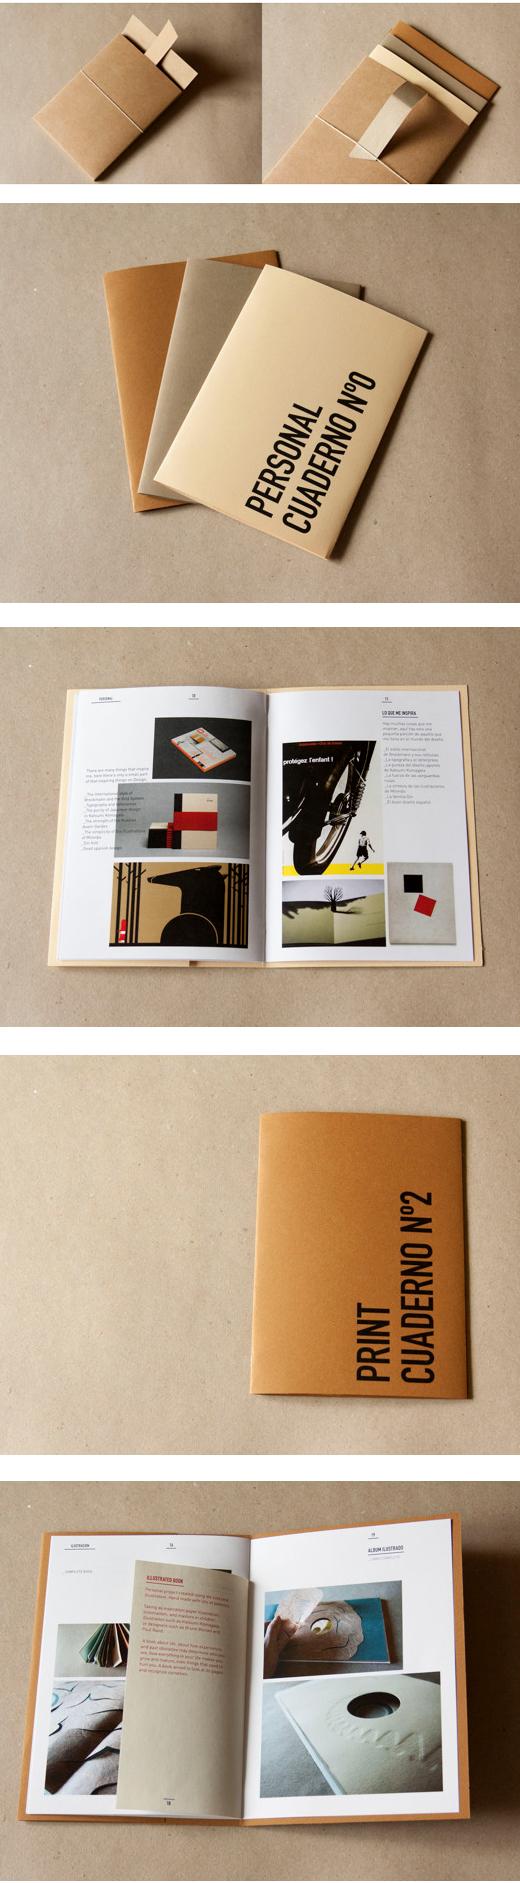 print_portfolio_9